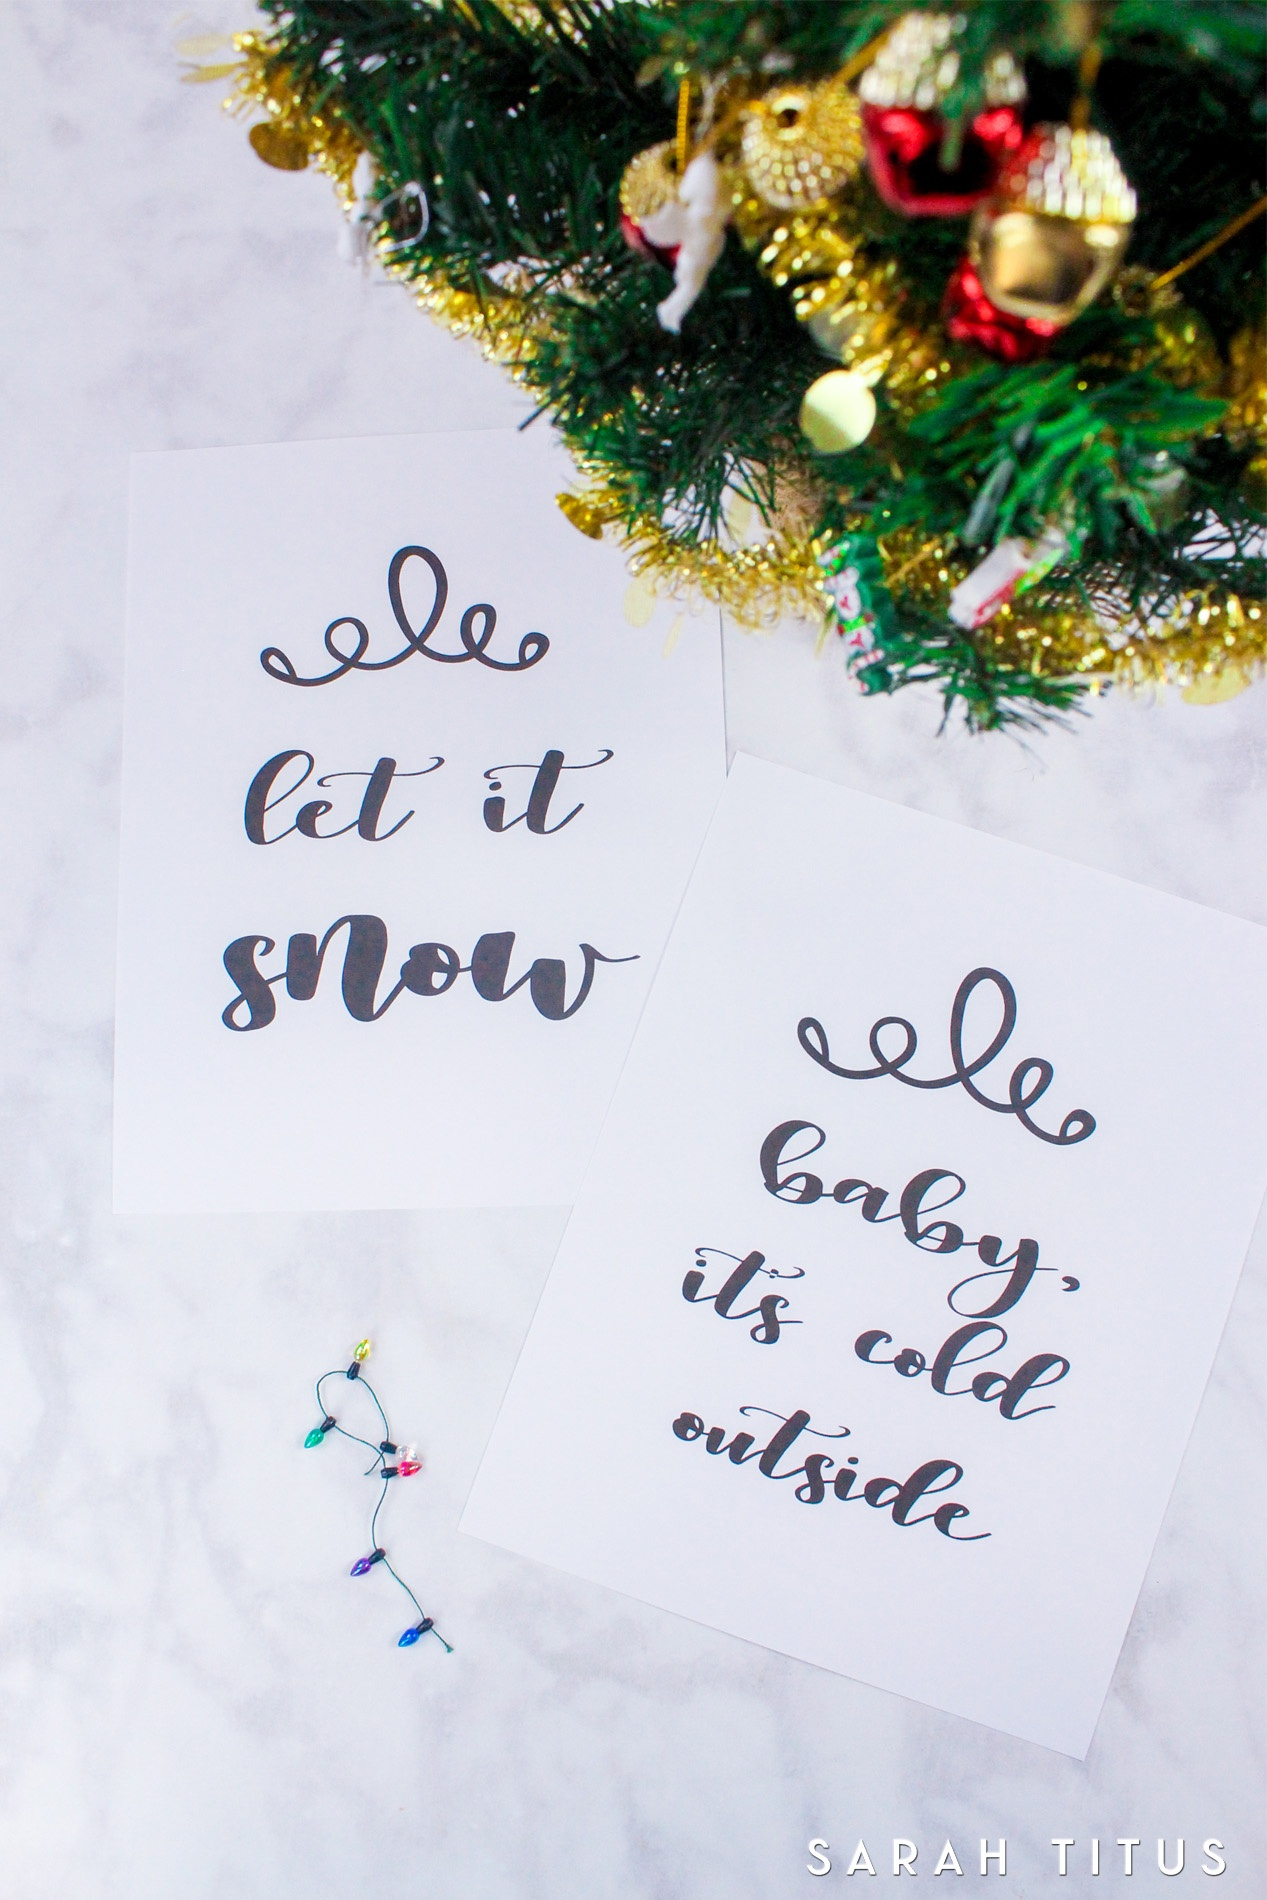 Free Printable Christmas Signs - Sarah Titus - Free Printable Holiday Signs Closed